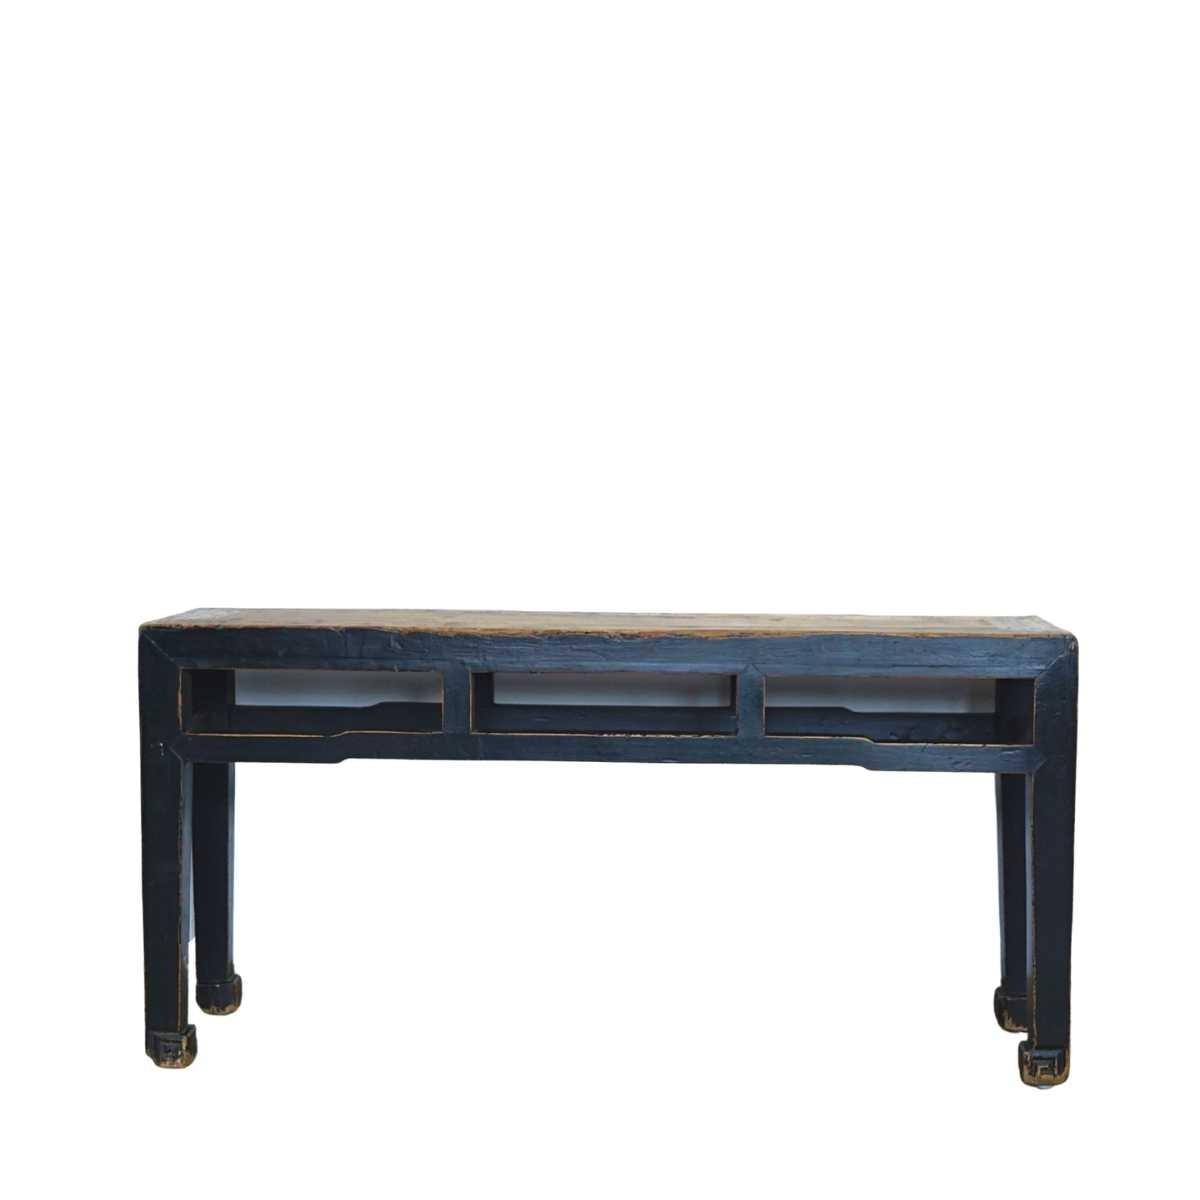 Sitzbank 101 cm Shandong Original China Möbel ca. 100 Jahre alt